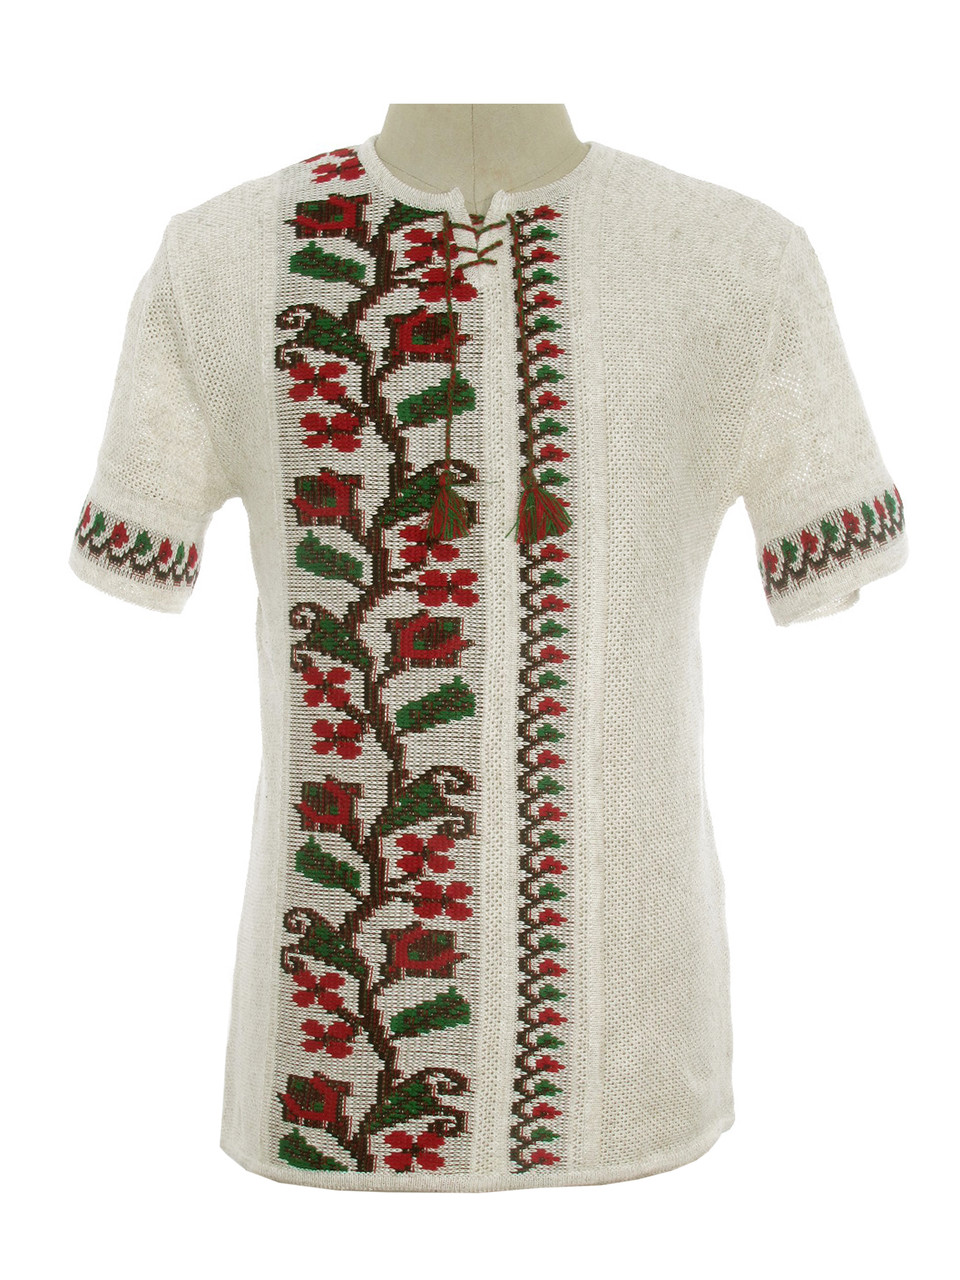 Мужская вязаная рубашка 20289 (короткий рукав)